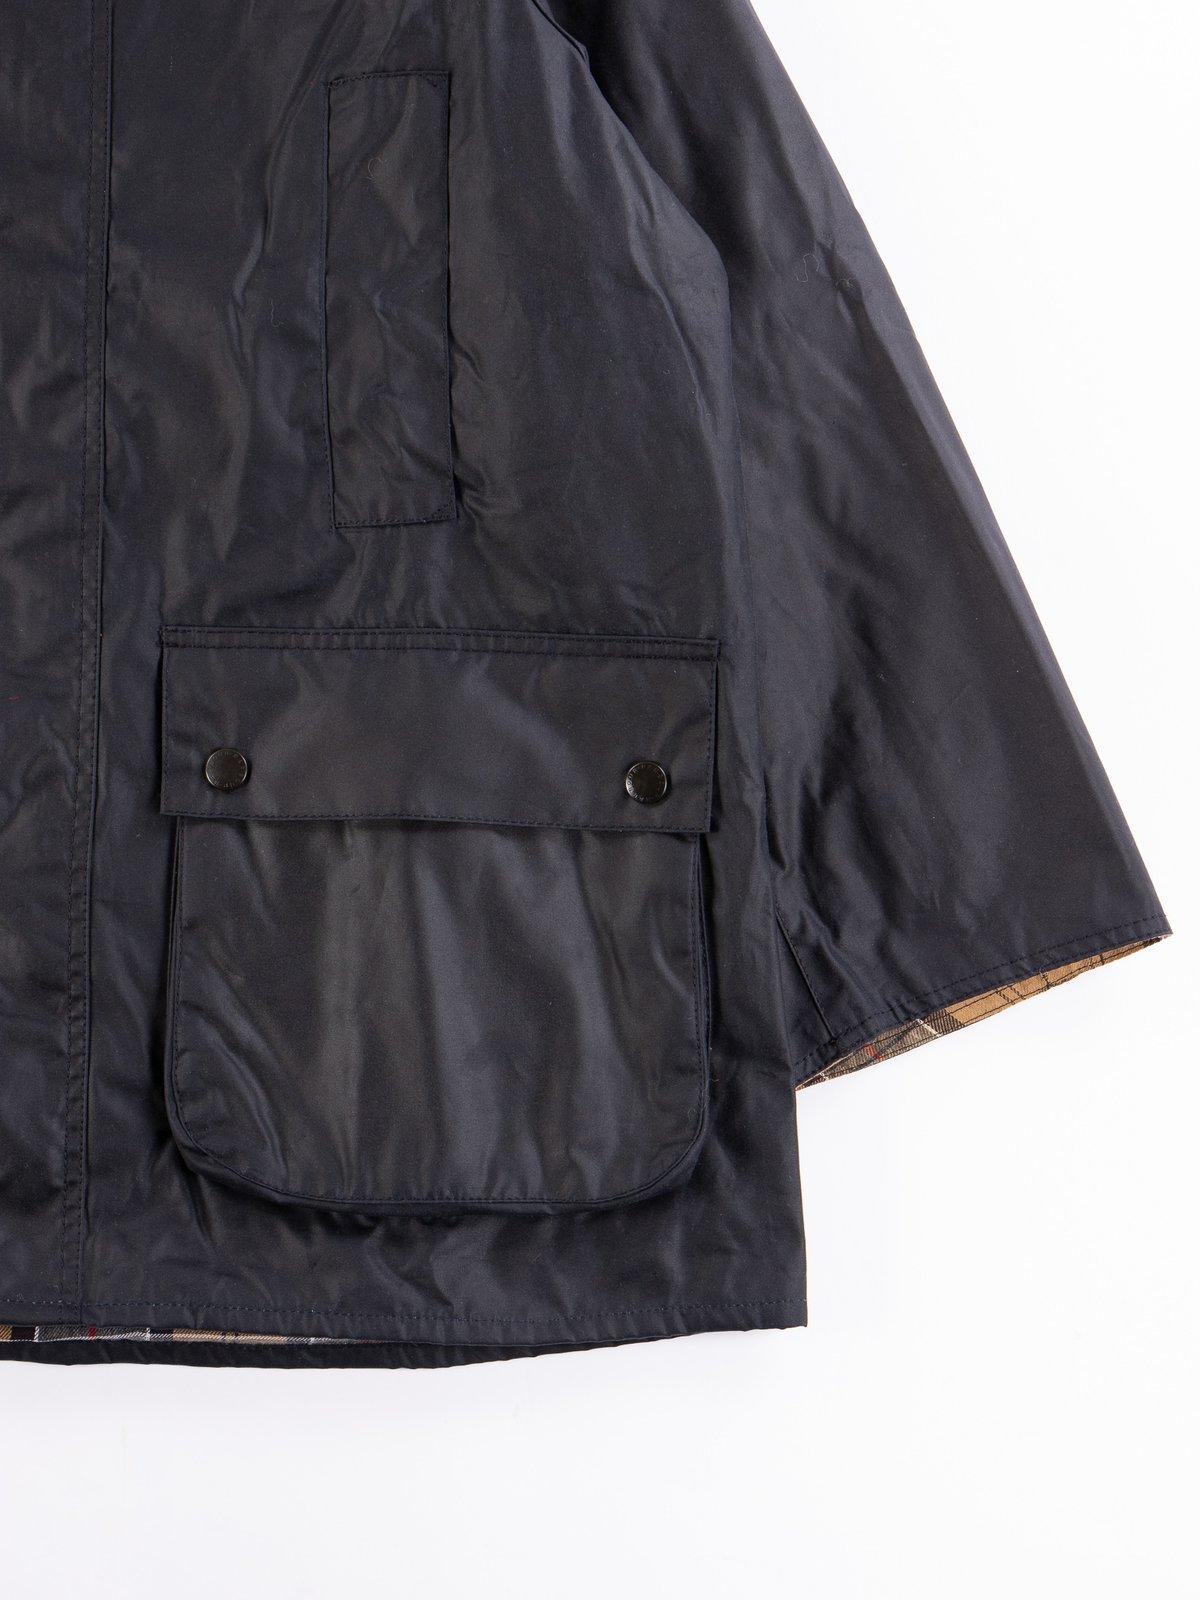 Navy Oversized Beaufort Waxed Cotton Jacket - Image 3